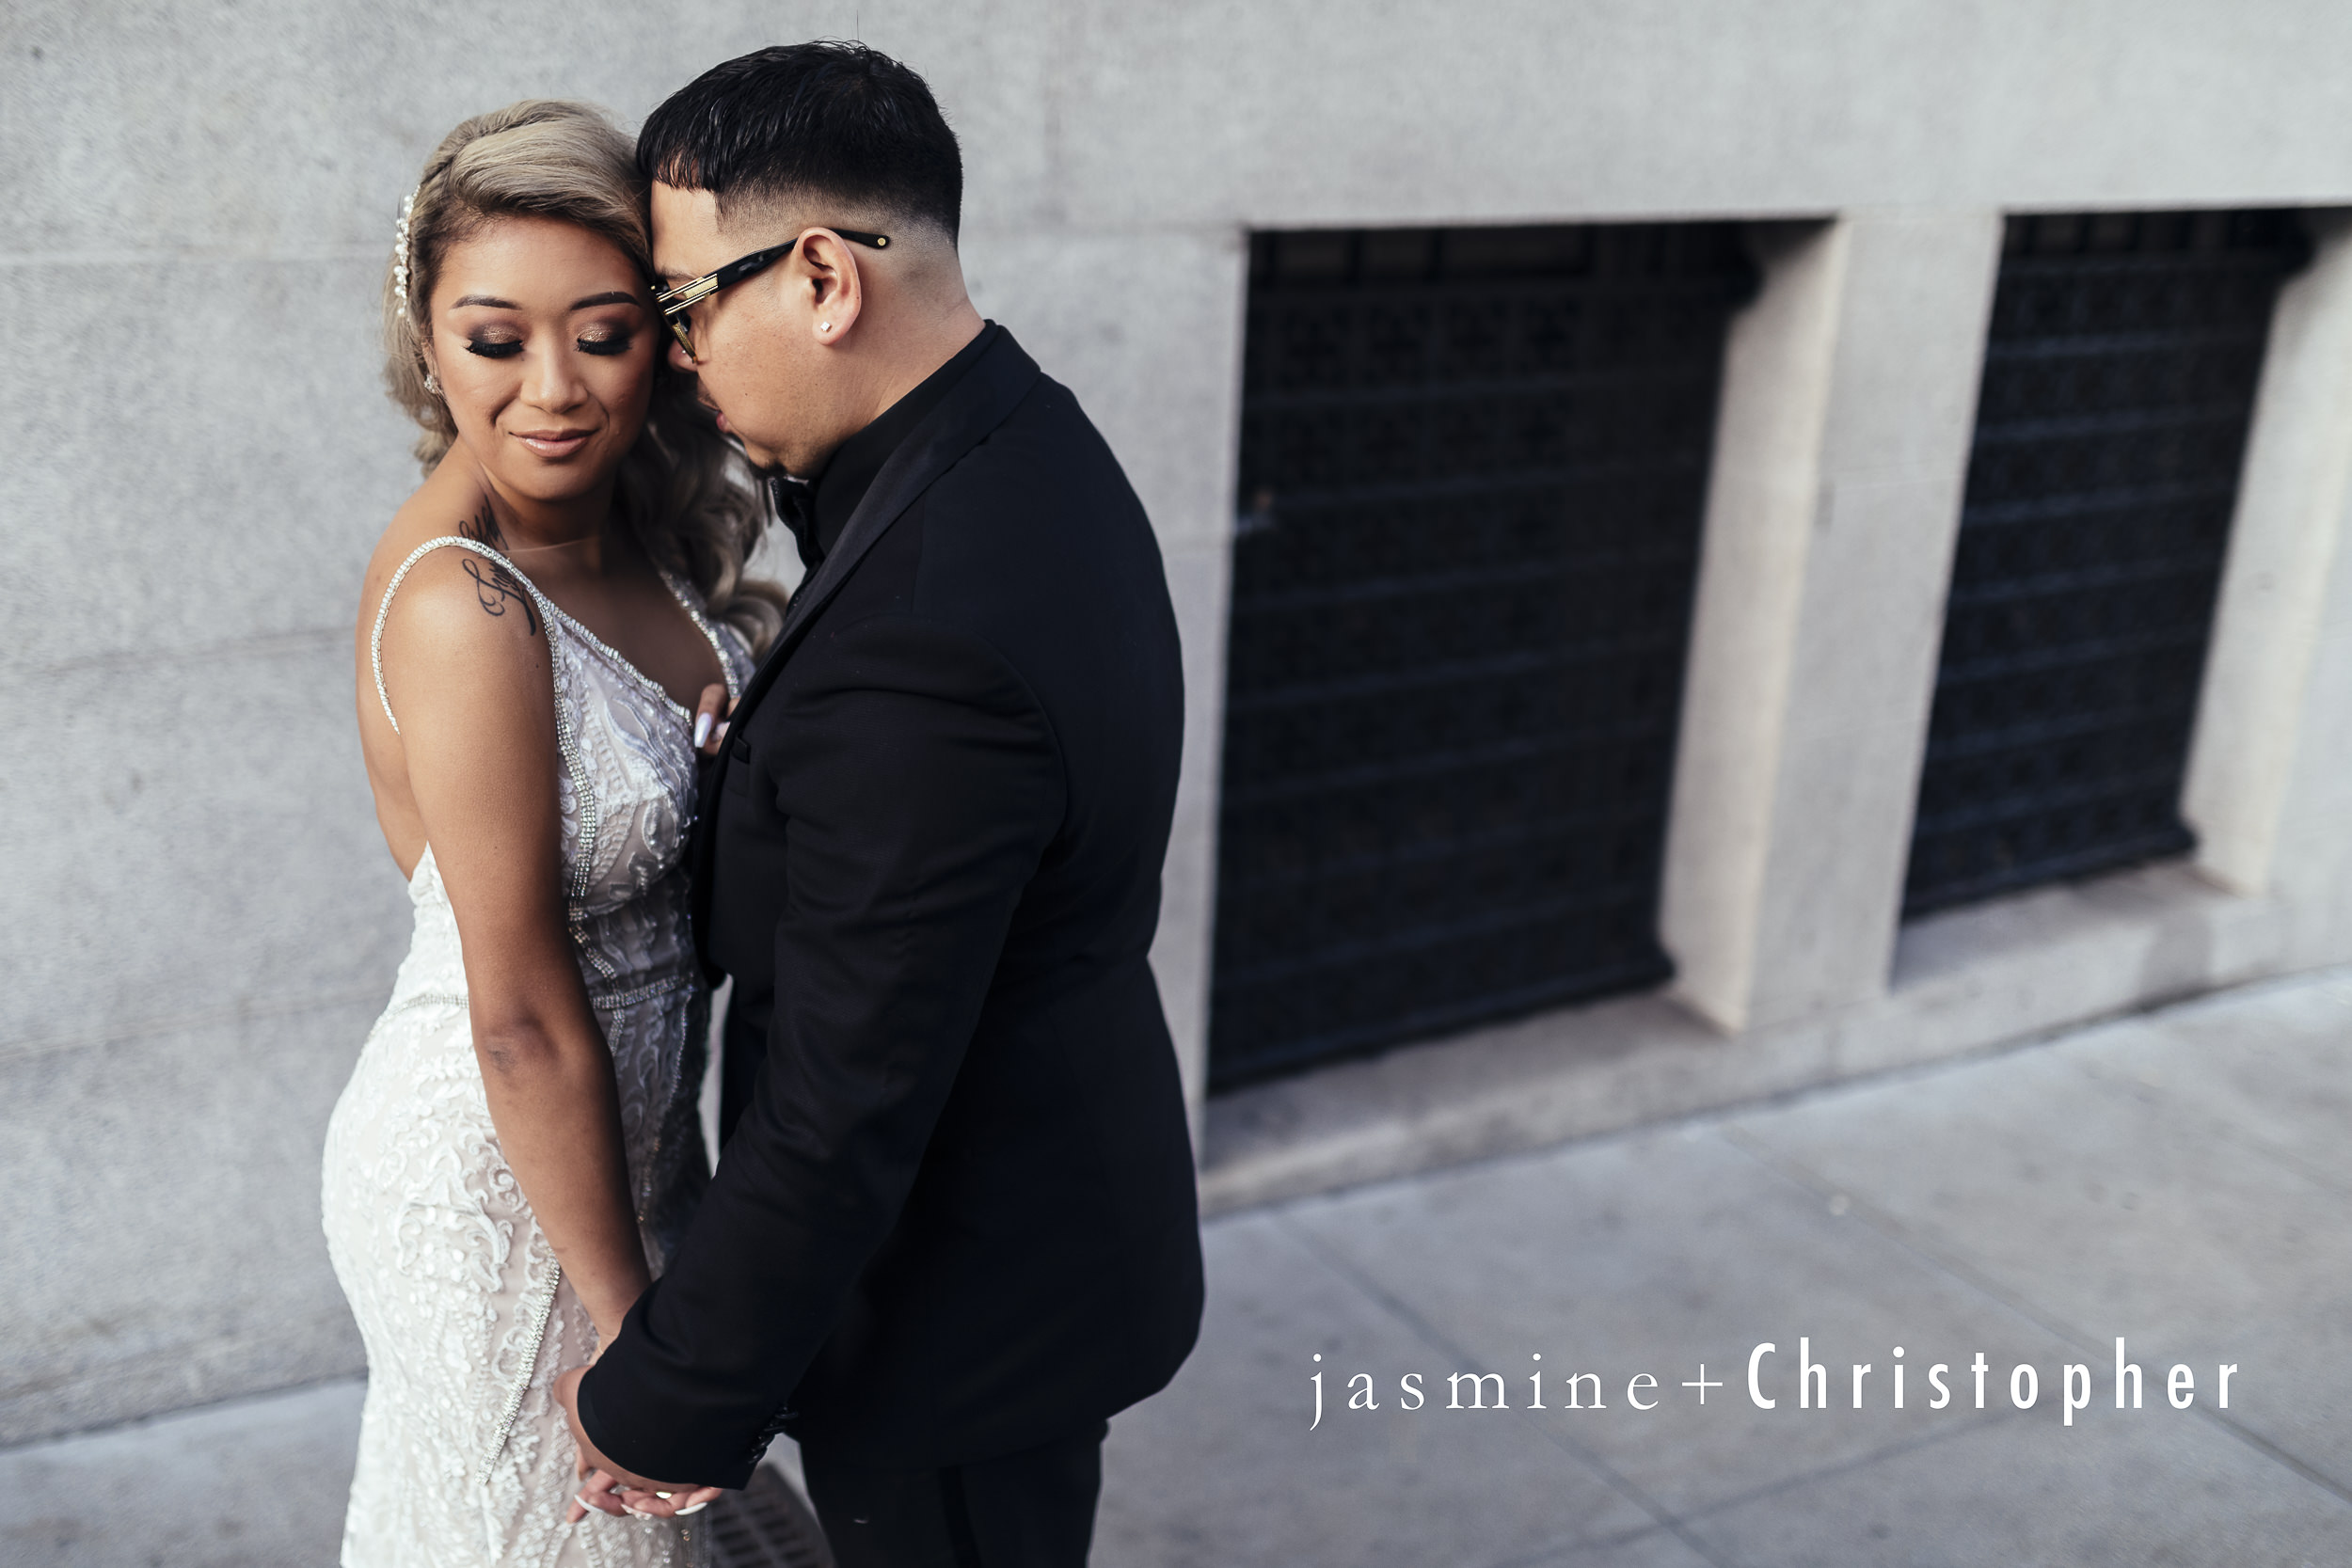 20180407-JasmineChris-MissionDoloresBasilicaWedding-RegencyBallroomWedding-SocialHallSFWedding-001.jpg